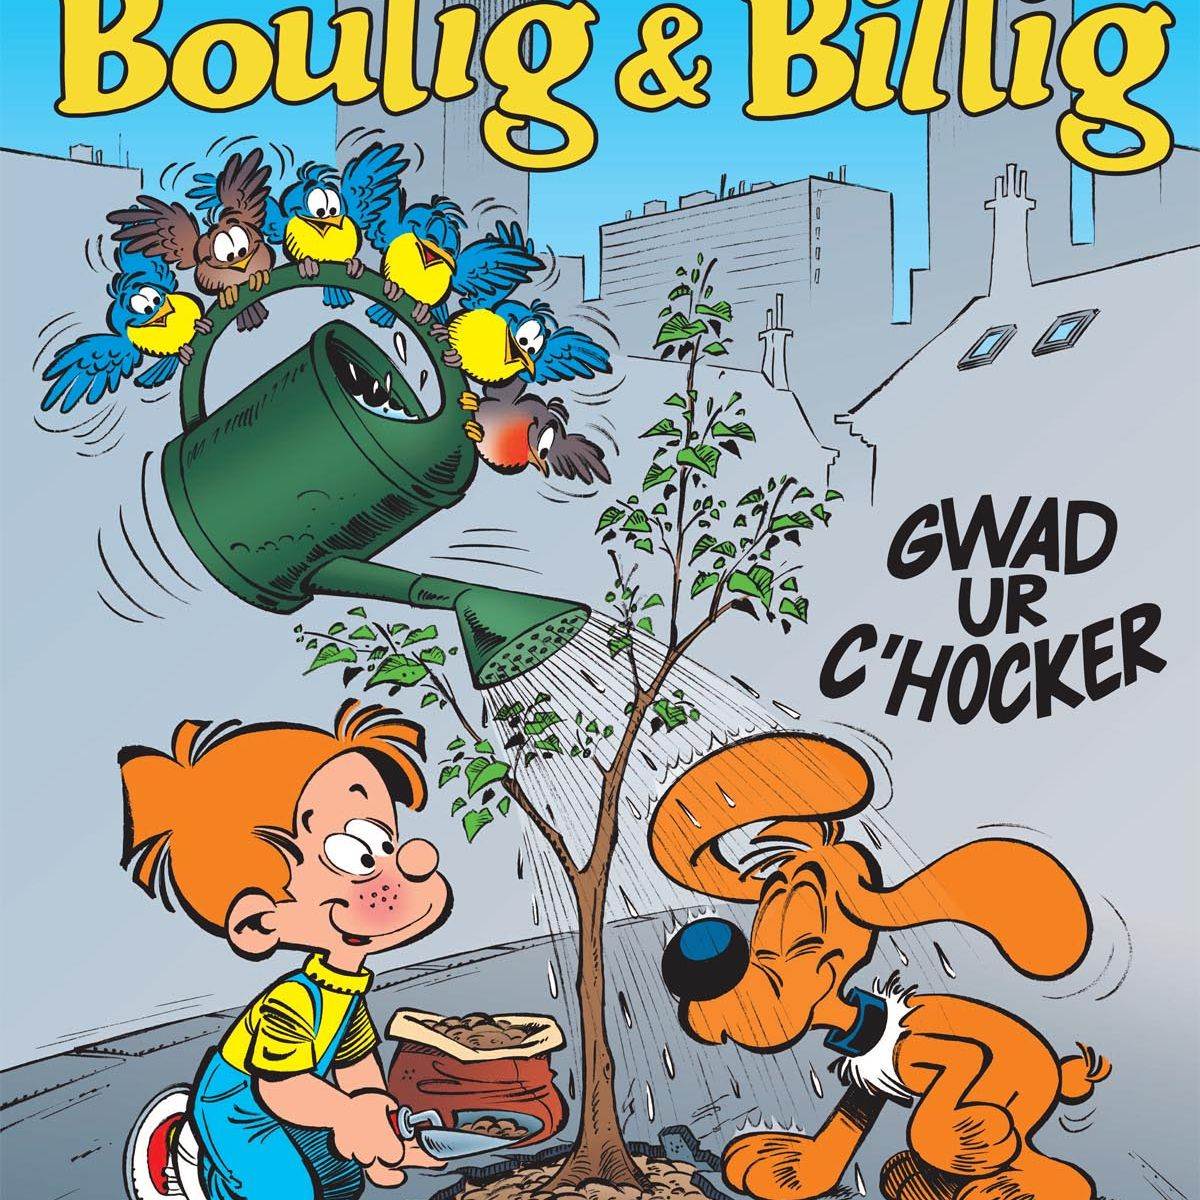 Boulig & Billig  : Gwad ur c'hocker